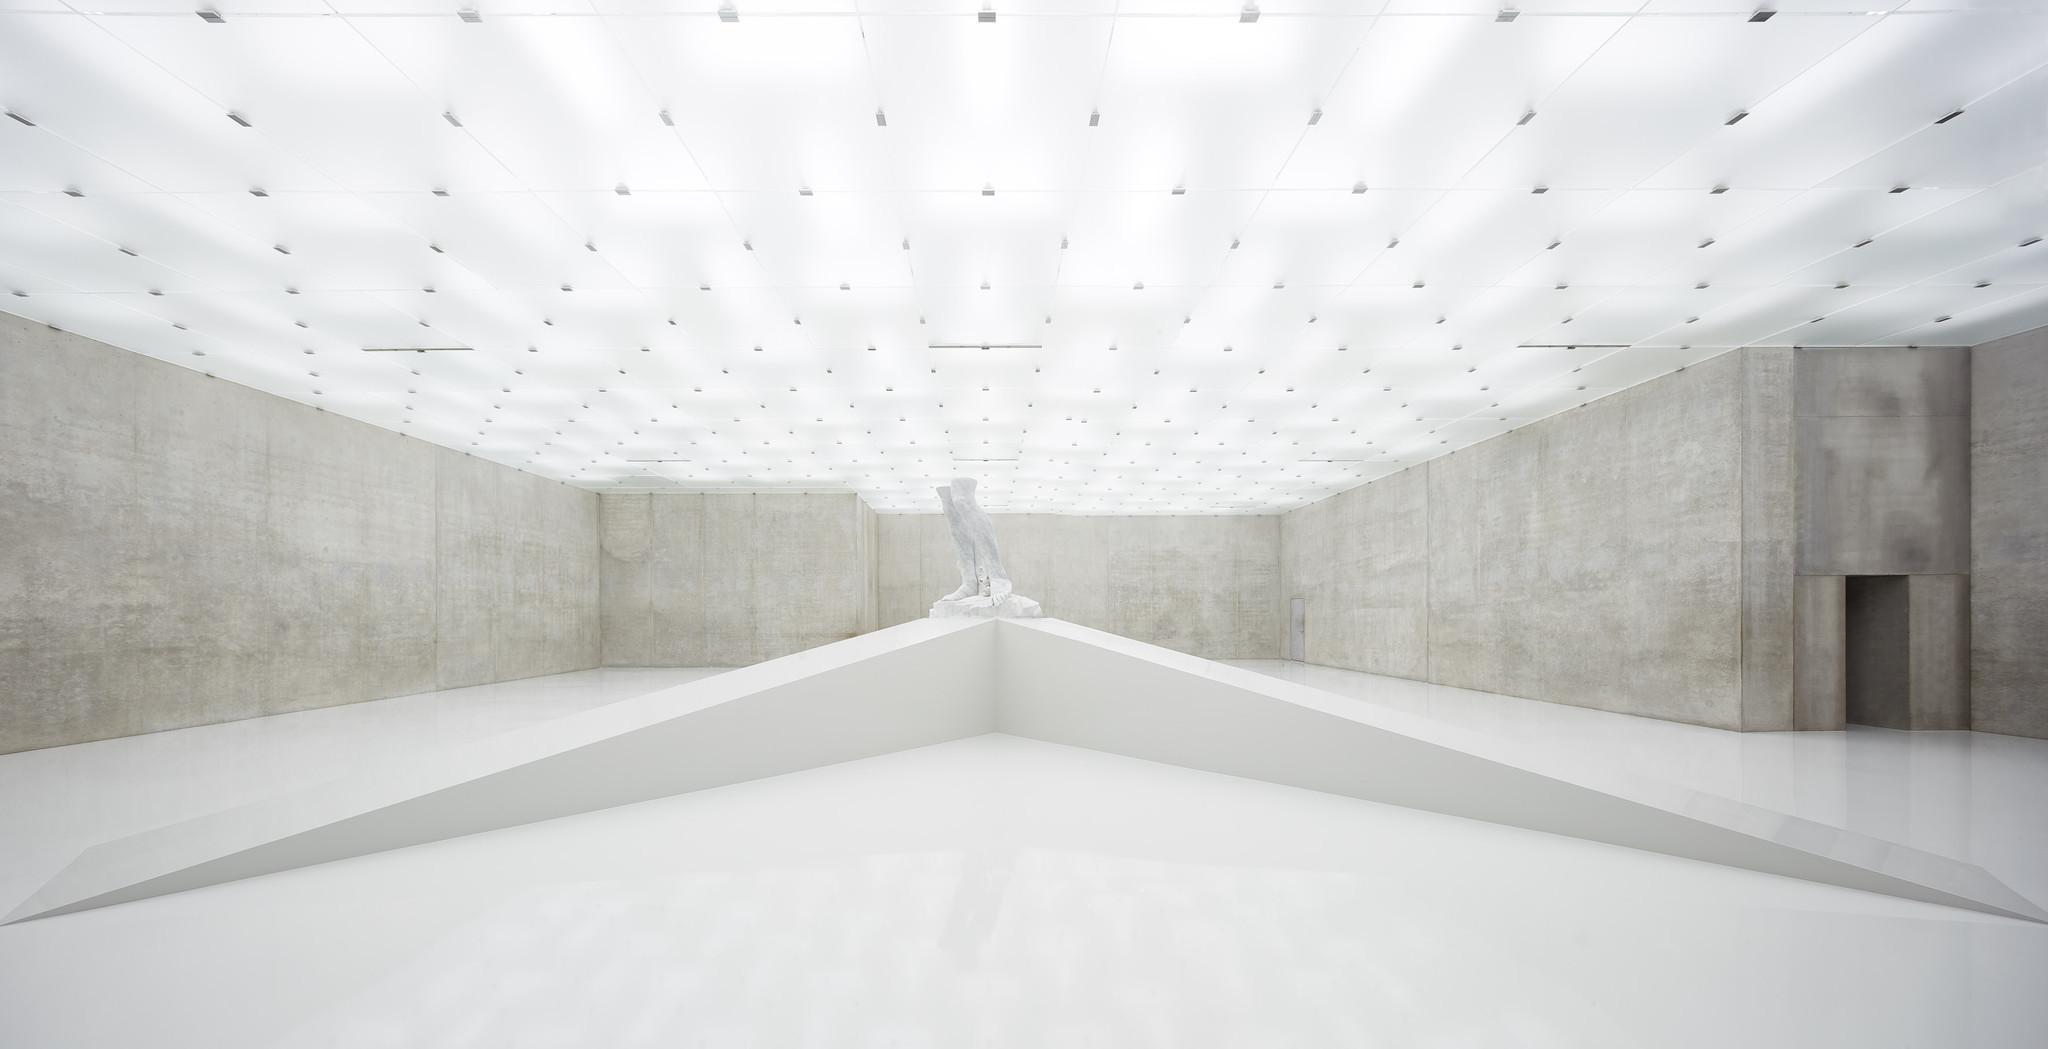 An installation view of Adrian Villar Roja's